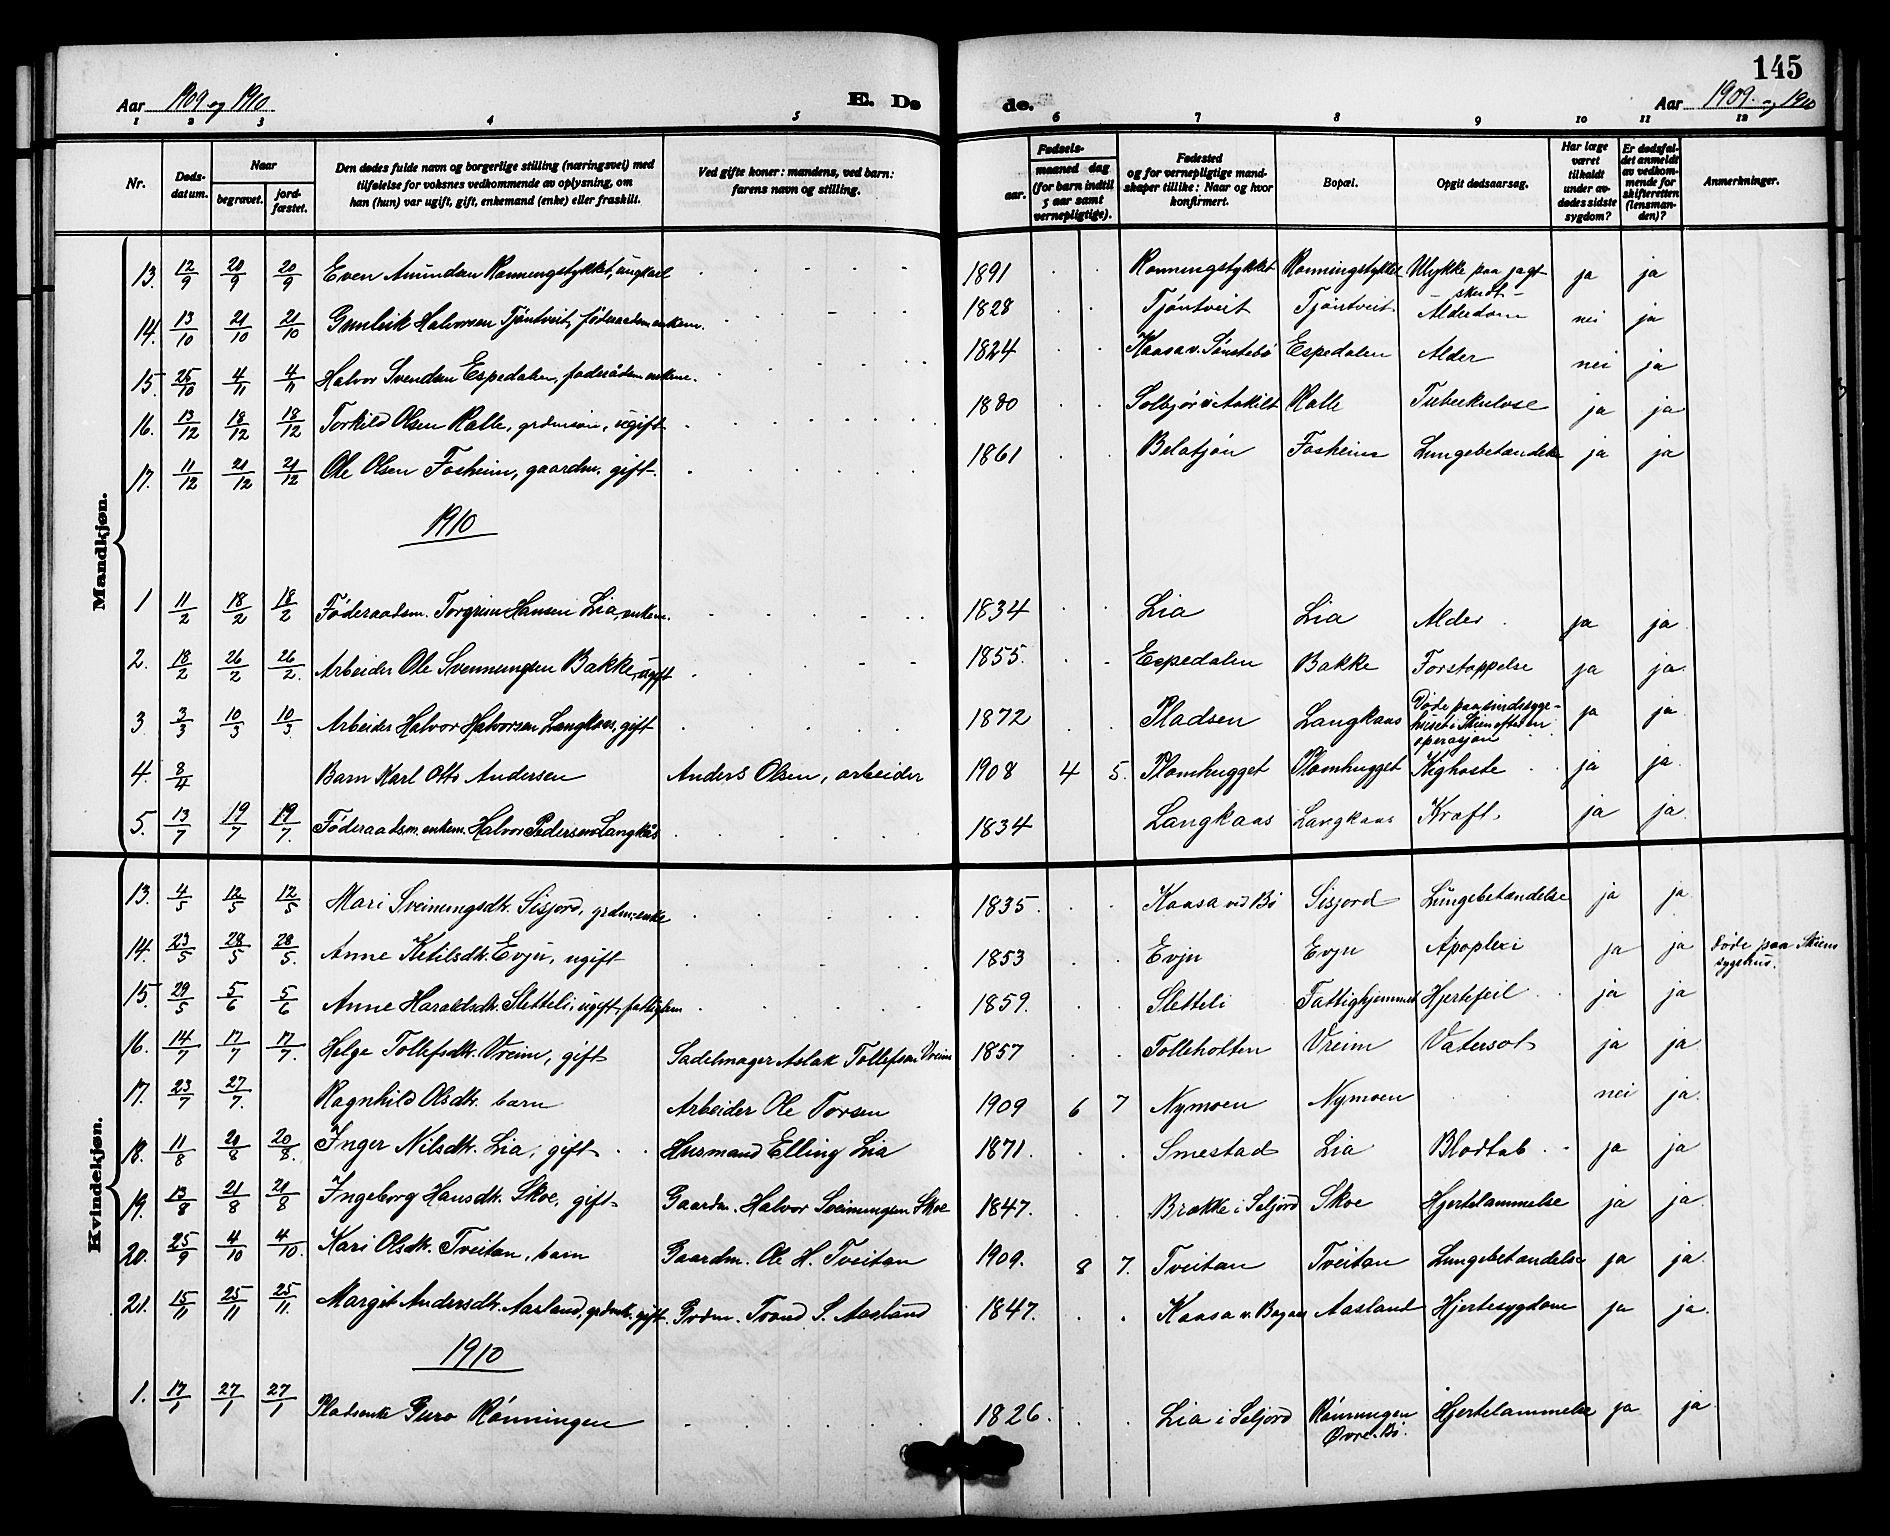 SAKO, Bø kirkebøker, G/Ga/L0007: Klokkerbok nr. 7, 1909-1924, s. 145